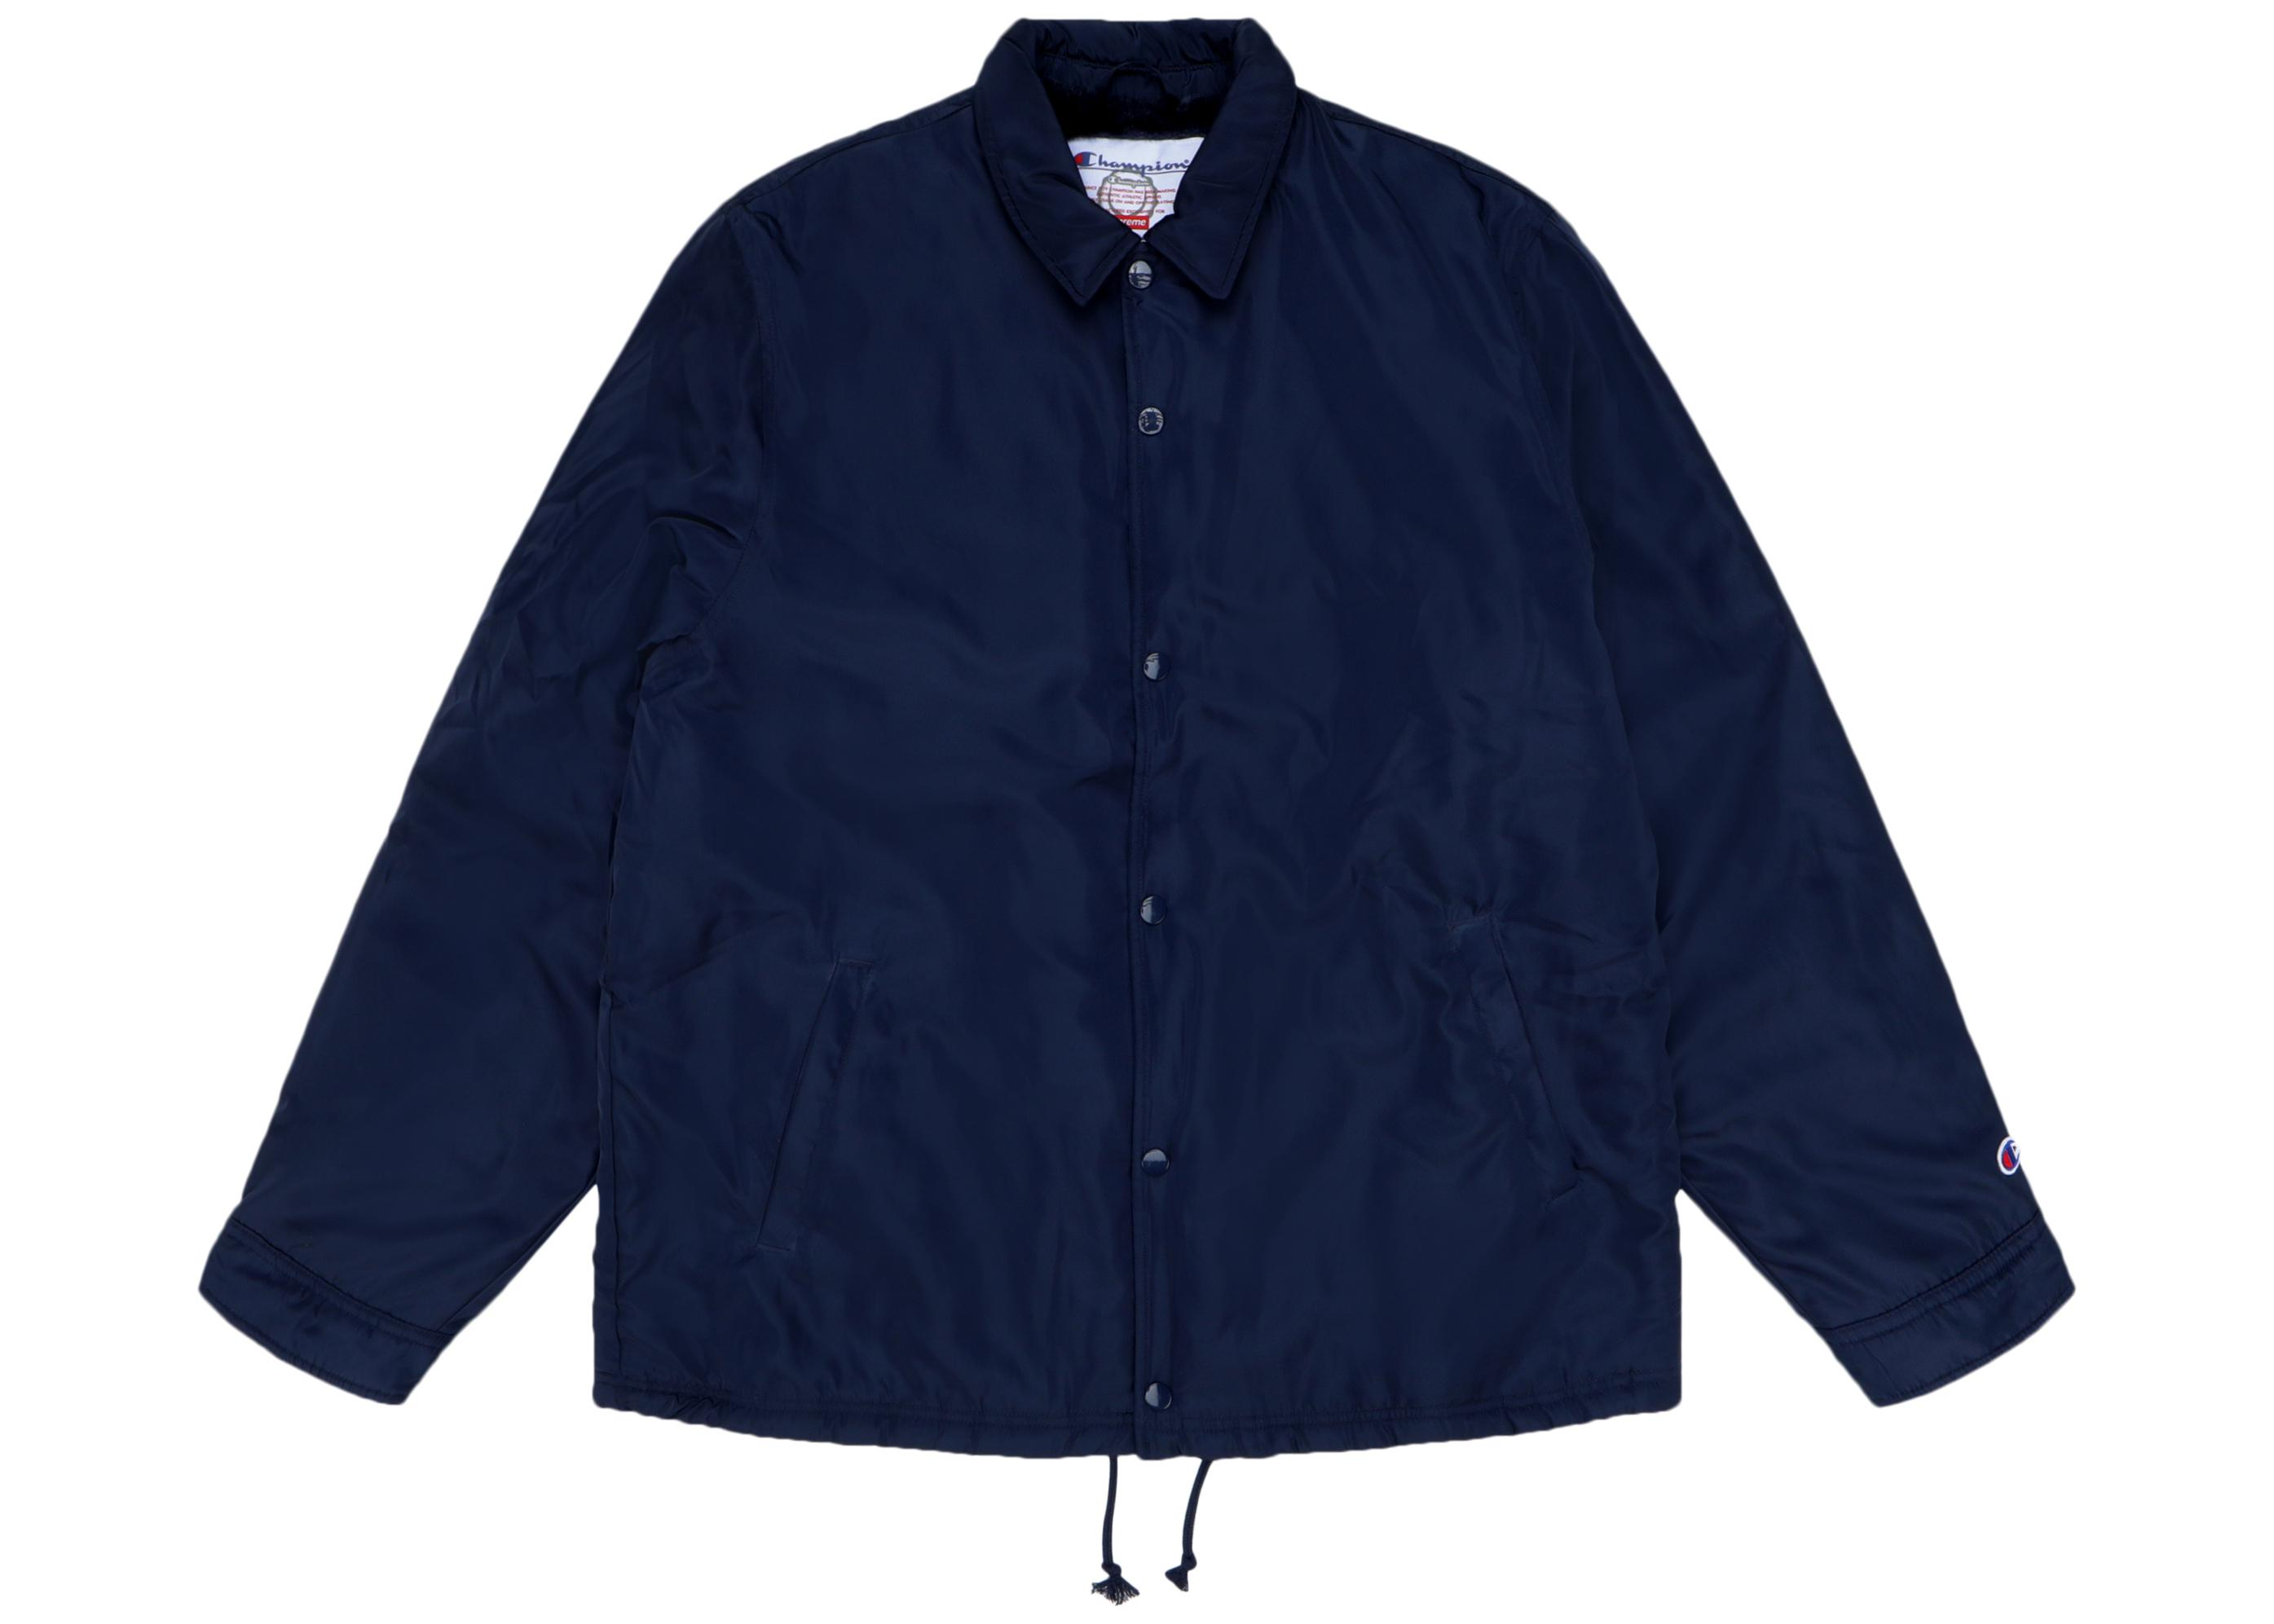 4d276e28 Lyst - Supreme Champion Label Coaches Jacket Navy in Blue for Men